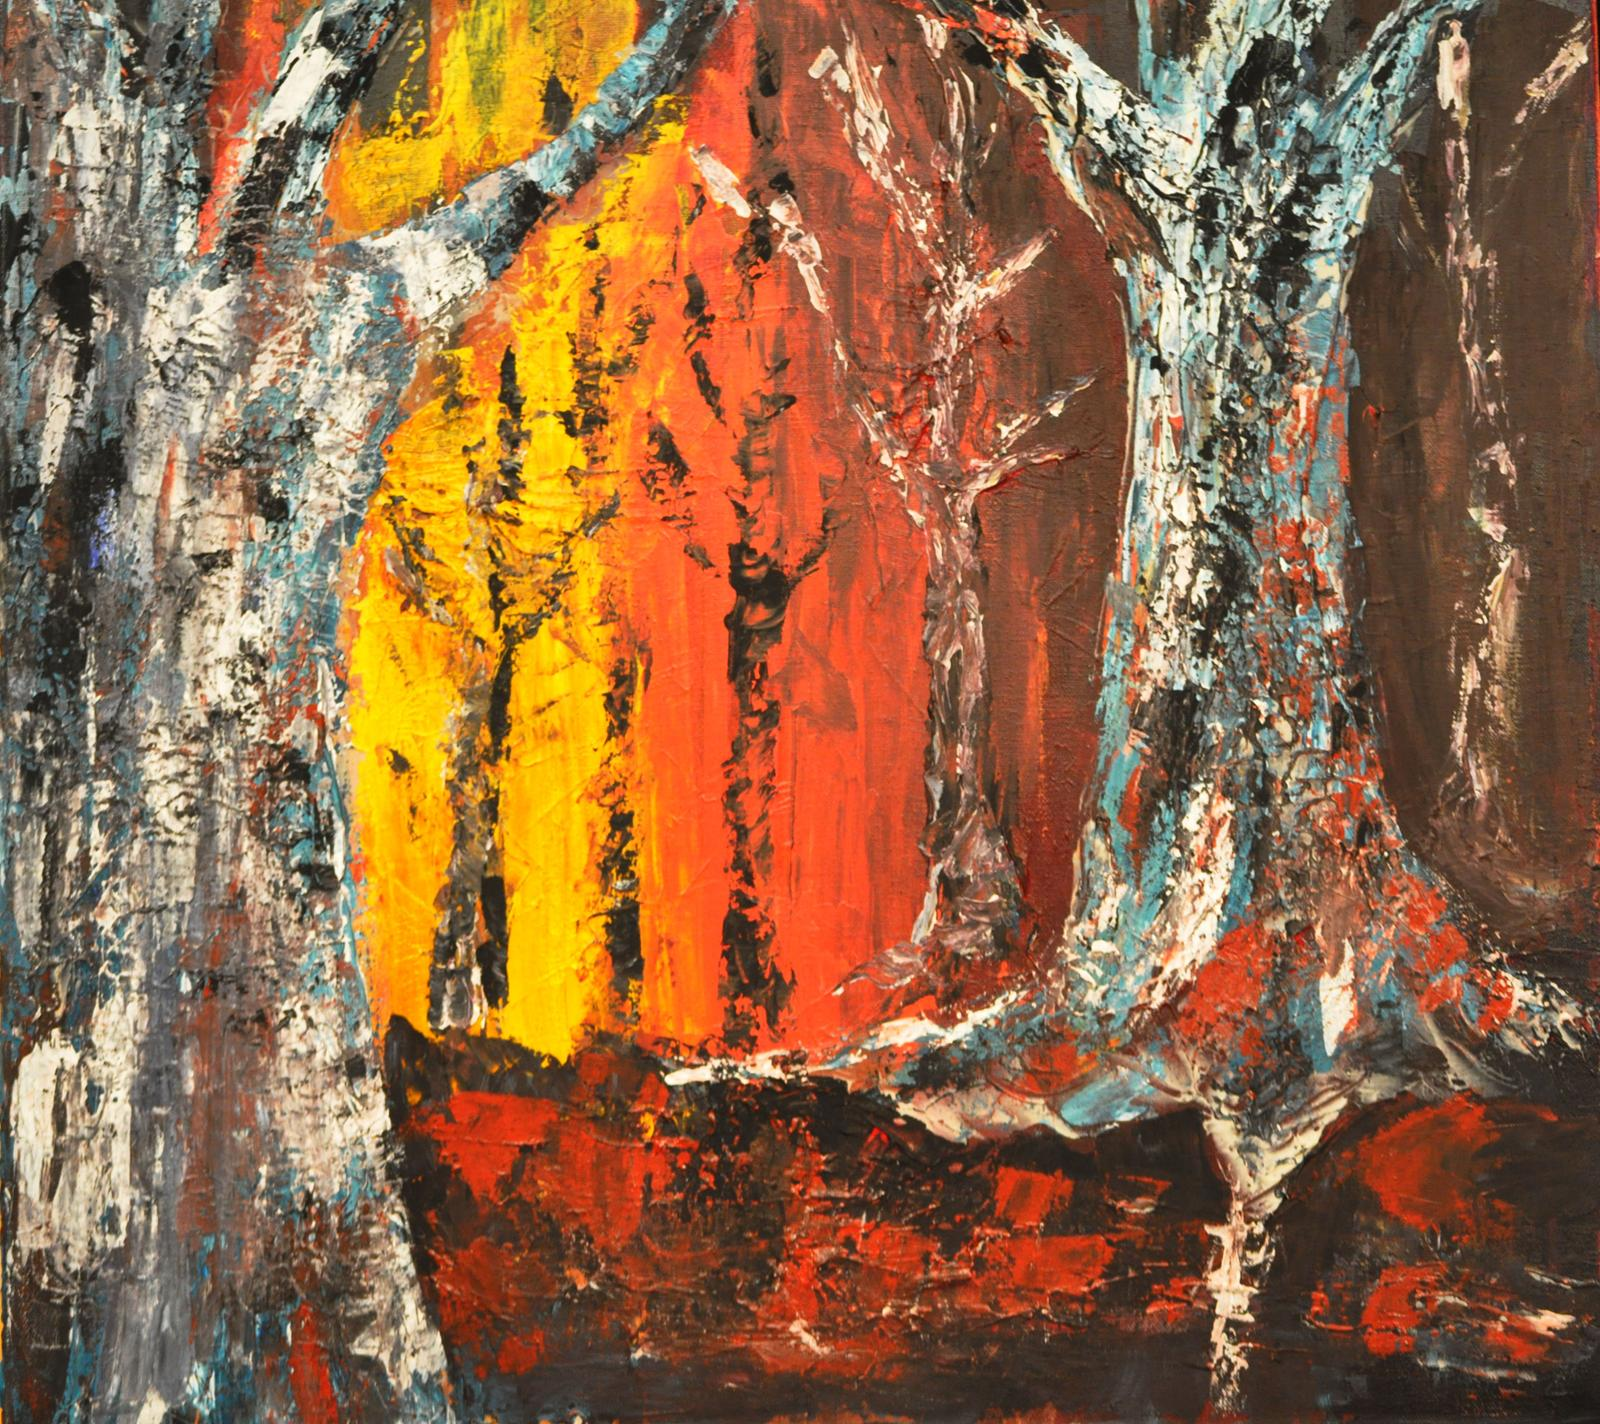 Trees 1 by Carol Baker (MG: April 2014)